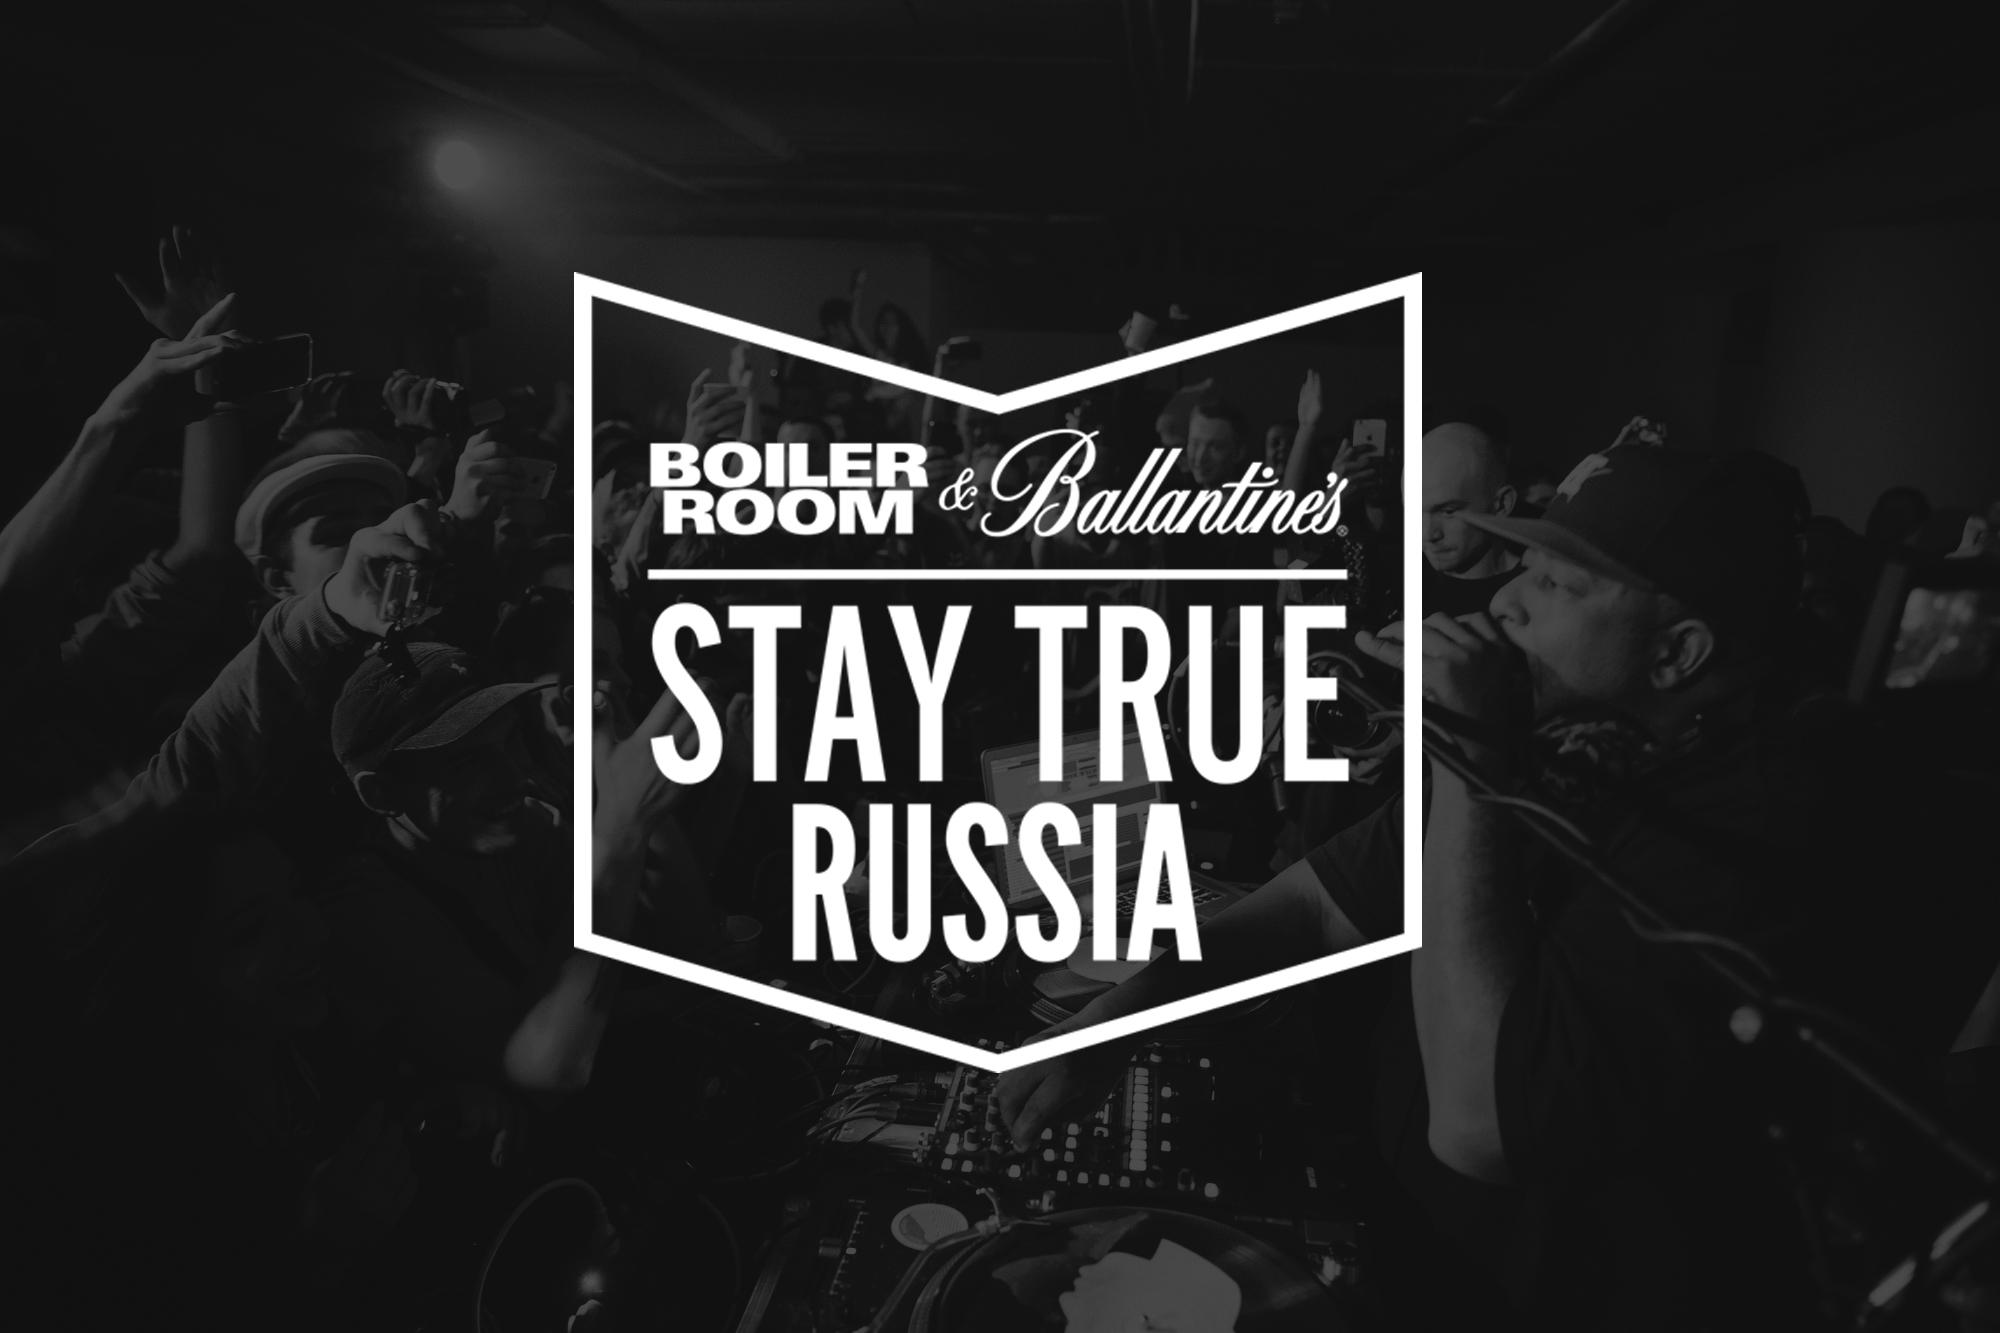 ballantines x boiler room presents stay true russia